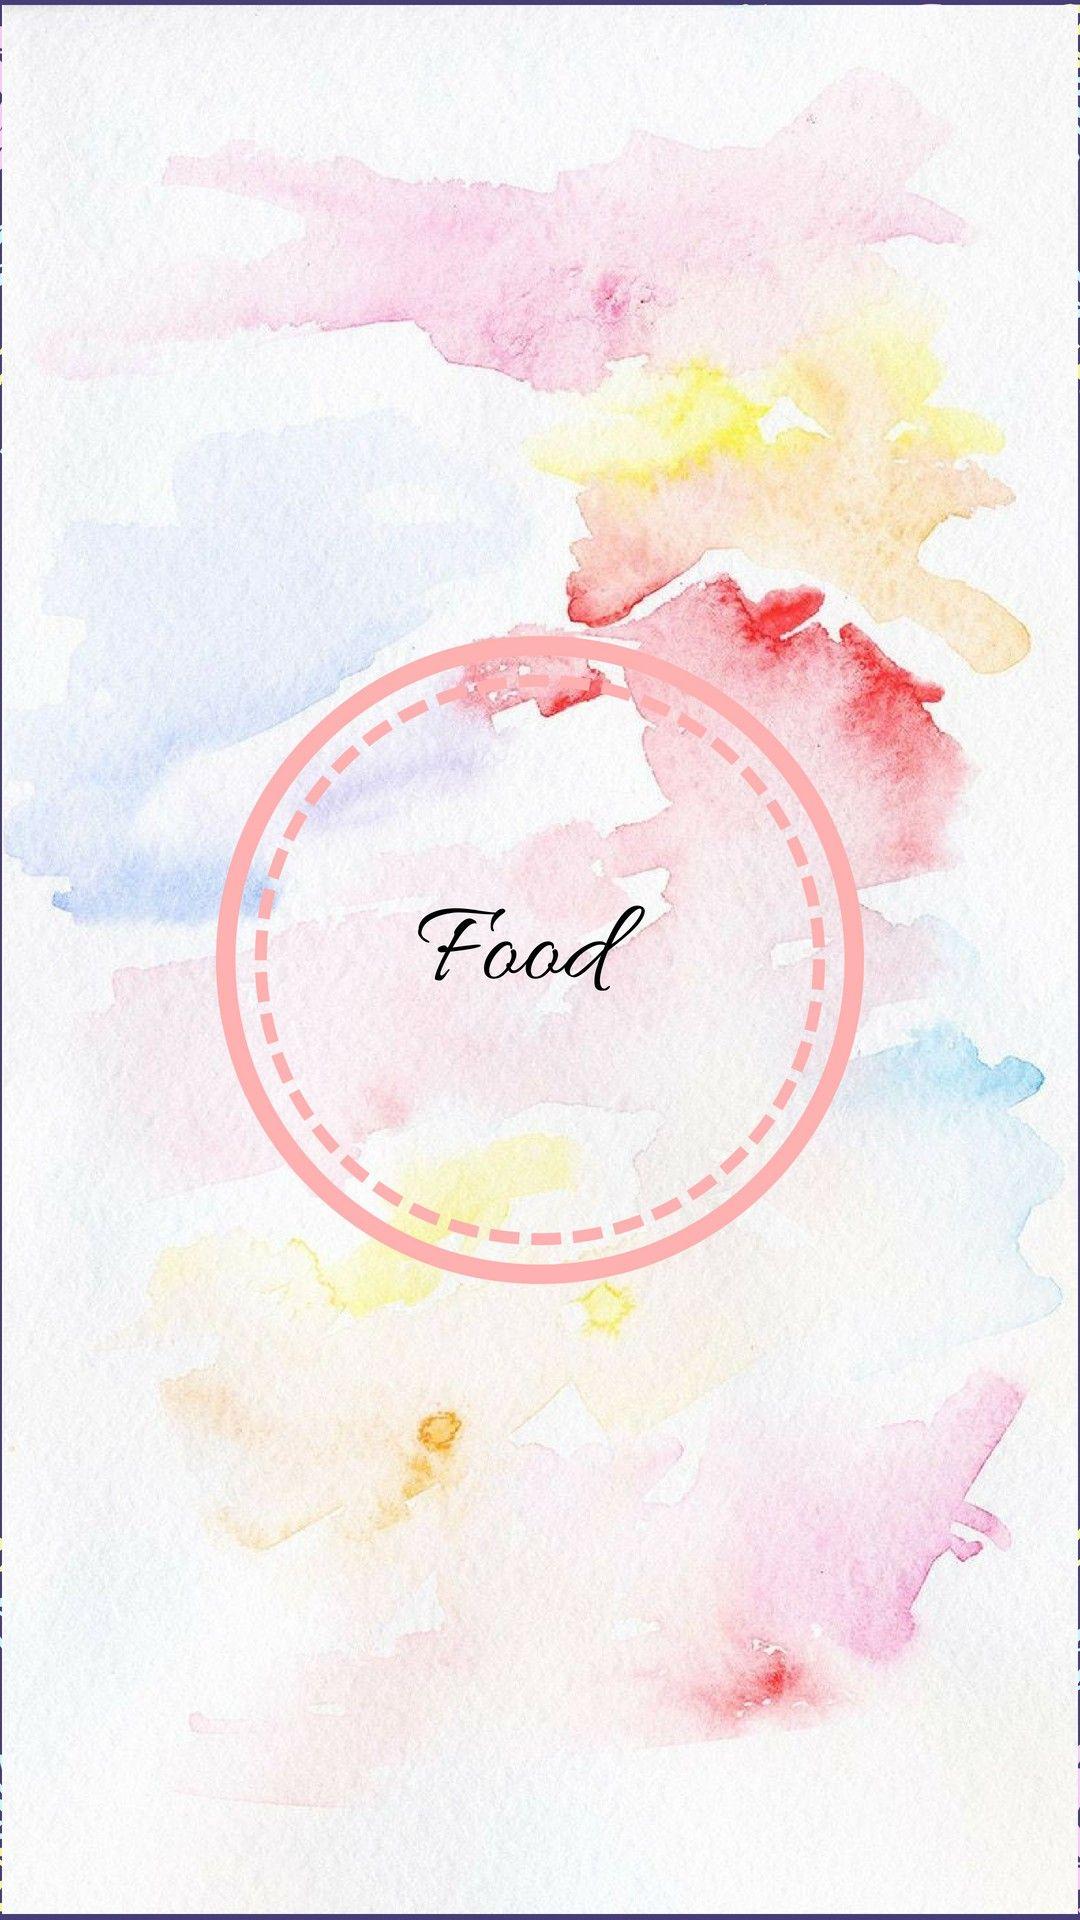 Aesthetic Pastel Pink Facetime Logo